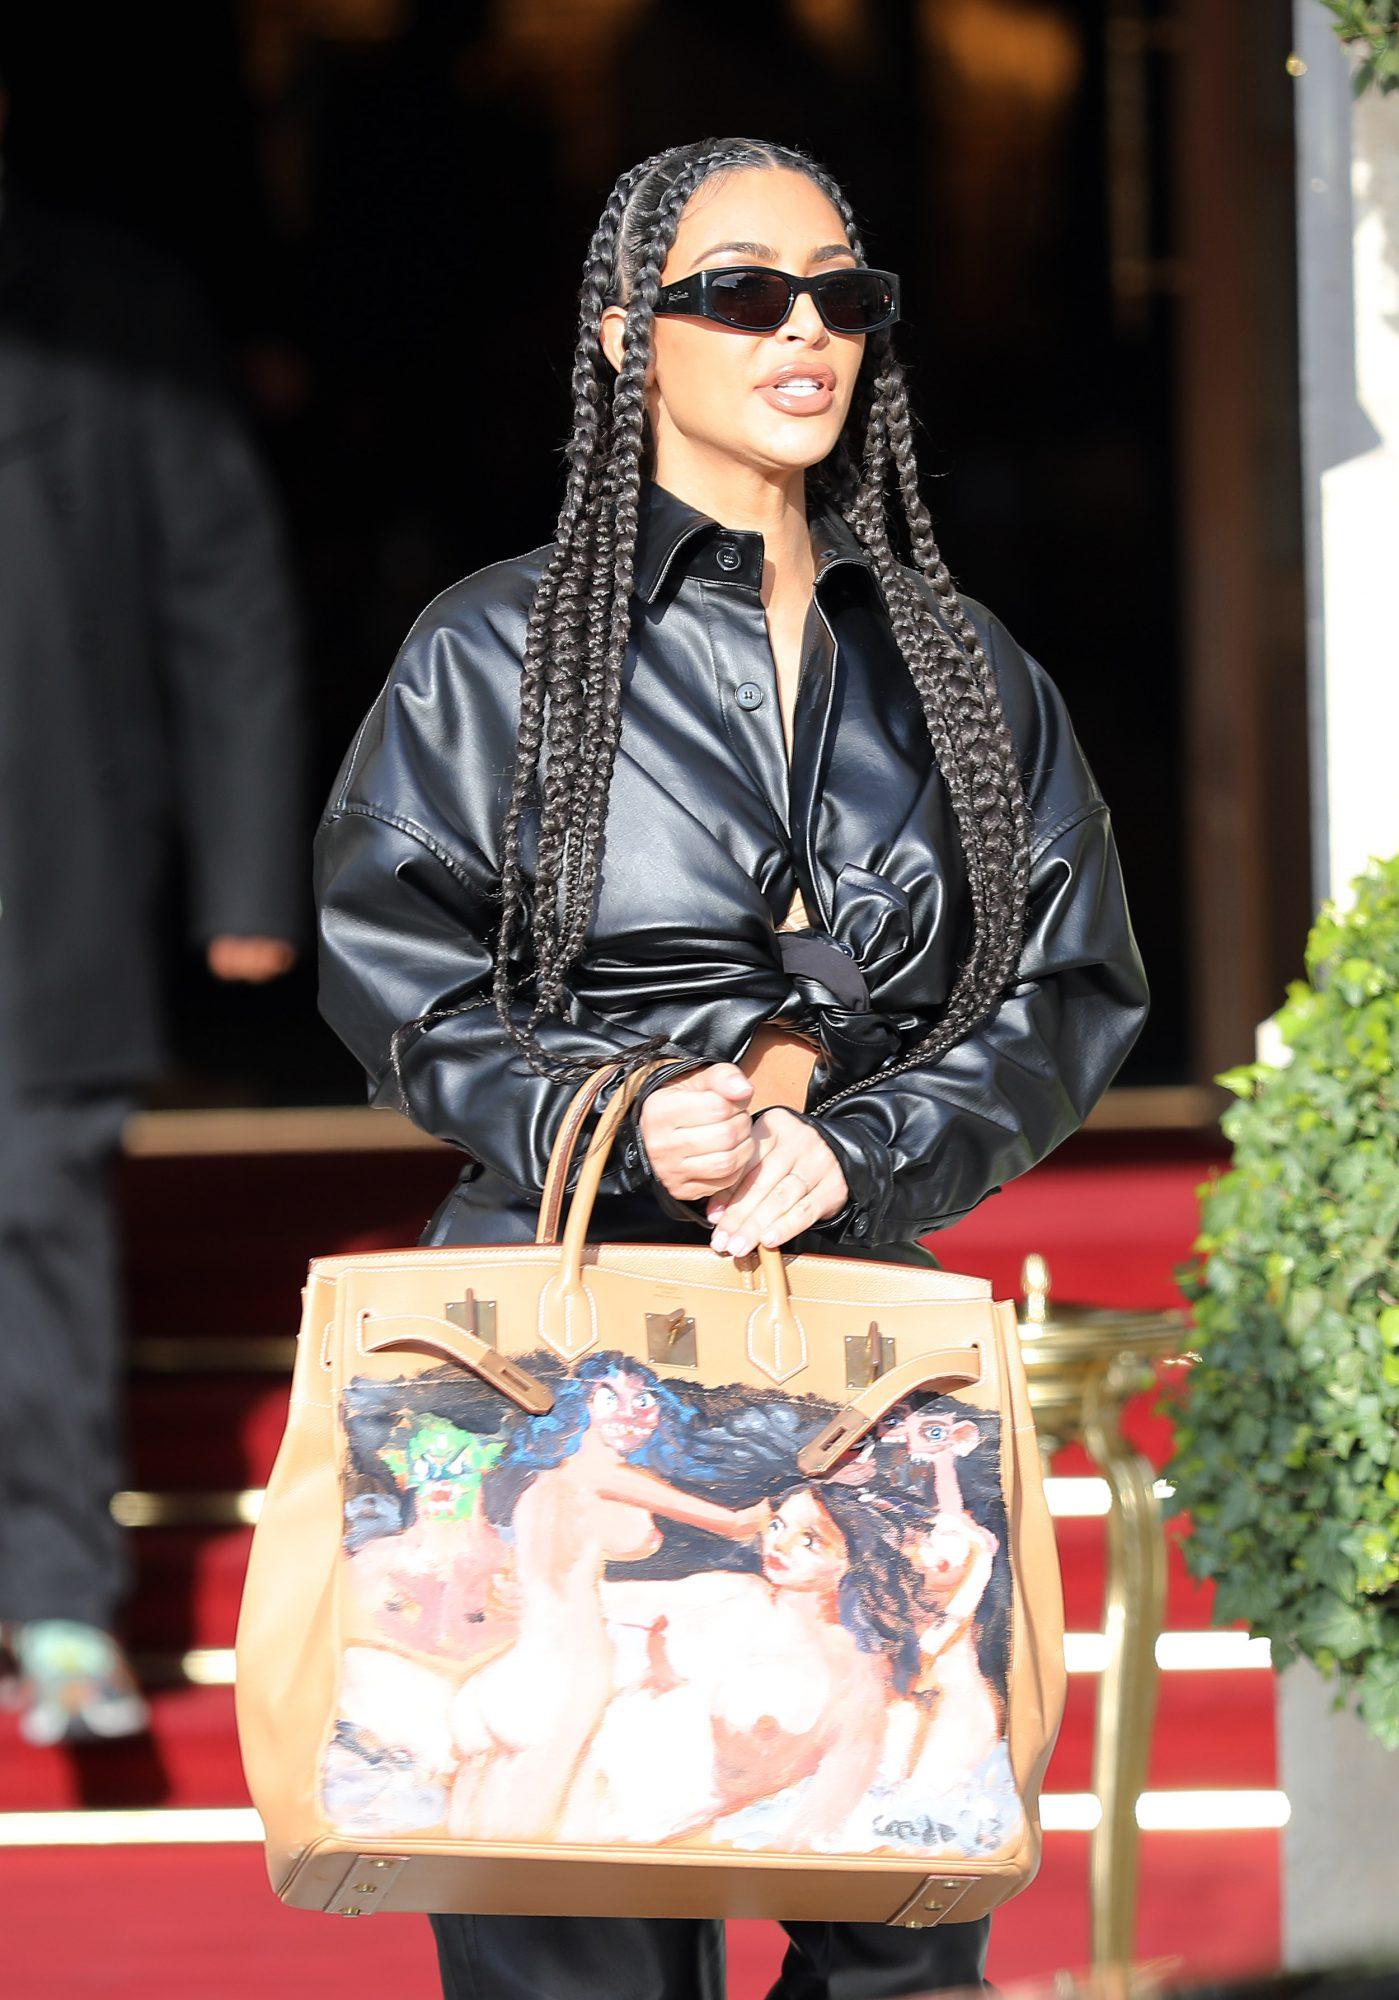 Kim Kardashian seen leaving Ritz Hotel during Paris Fashion Week on March 3, 2020 in Paris, France